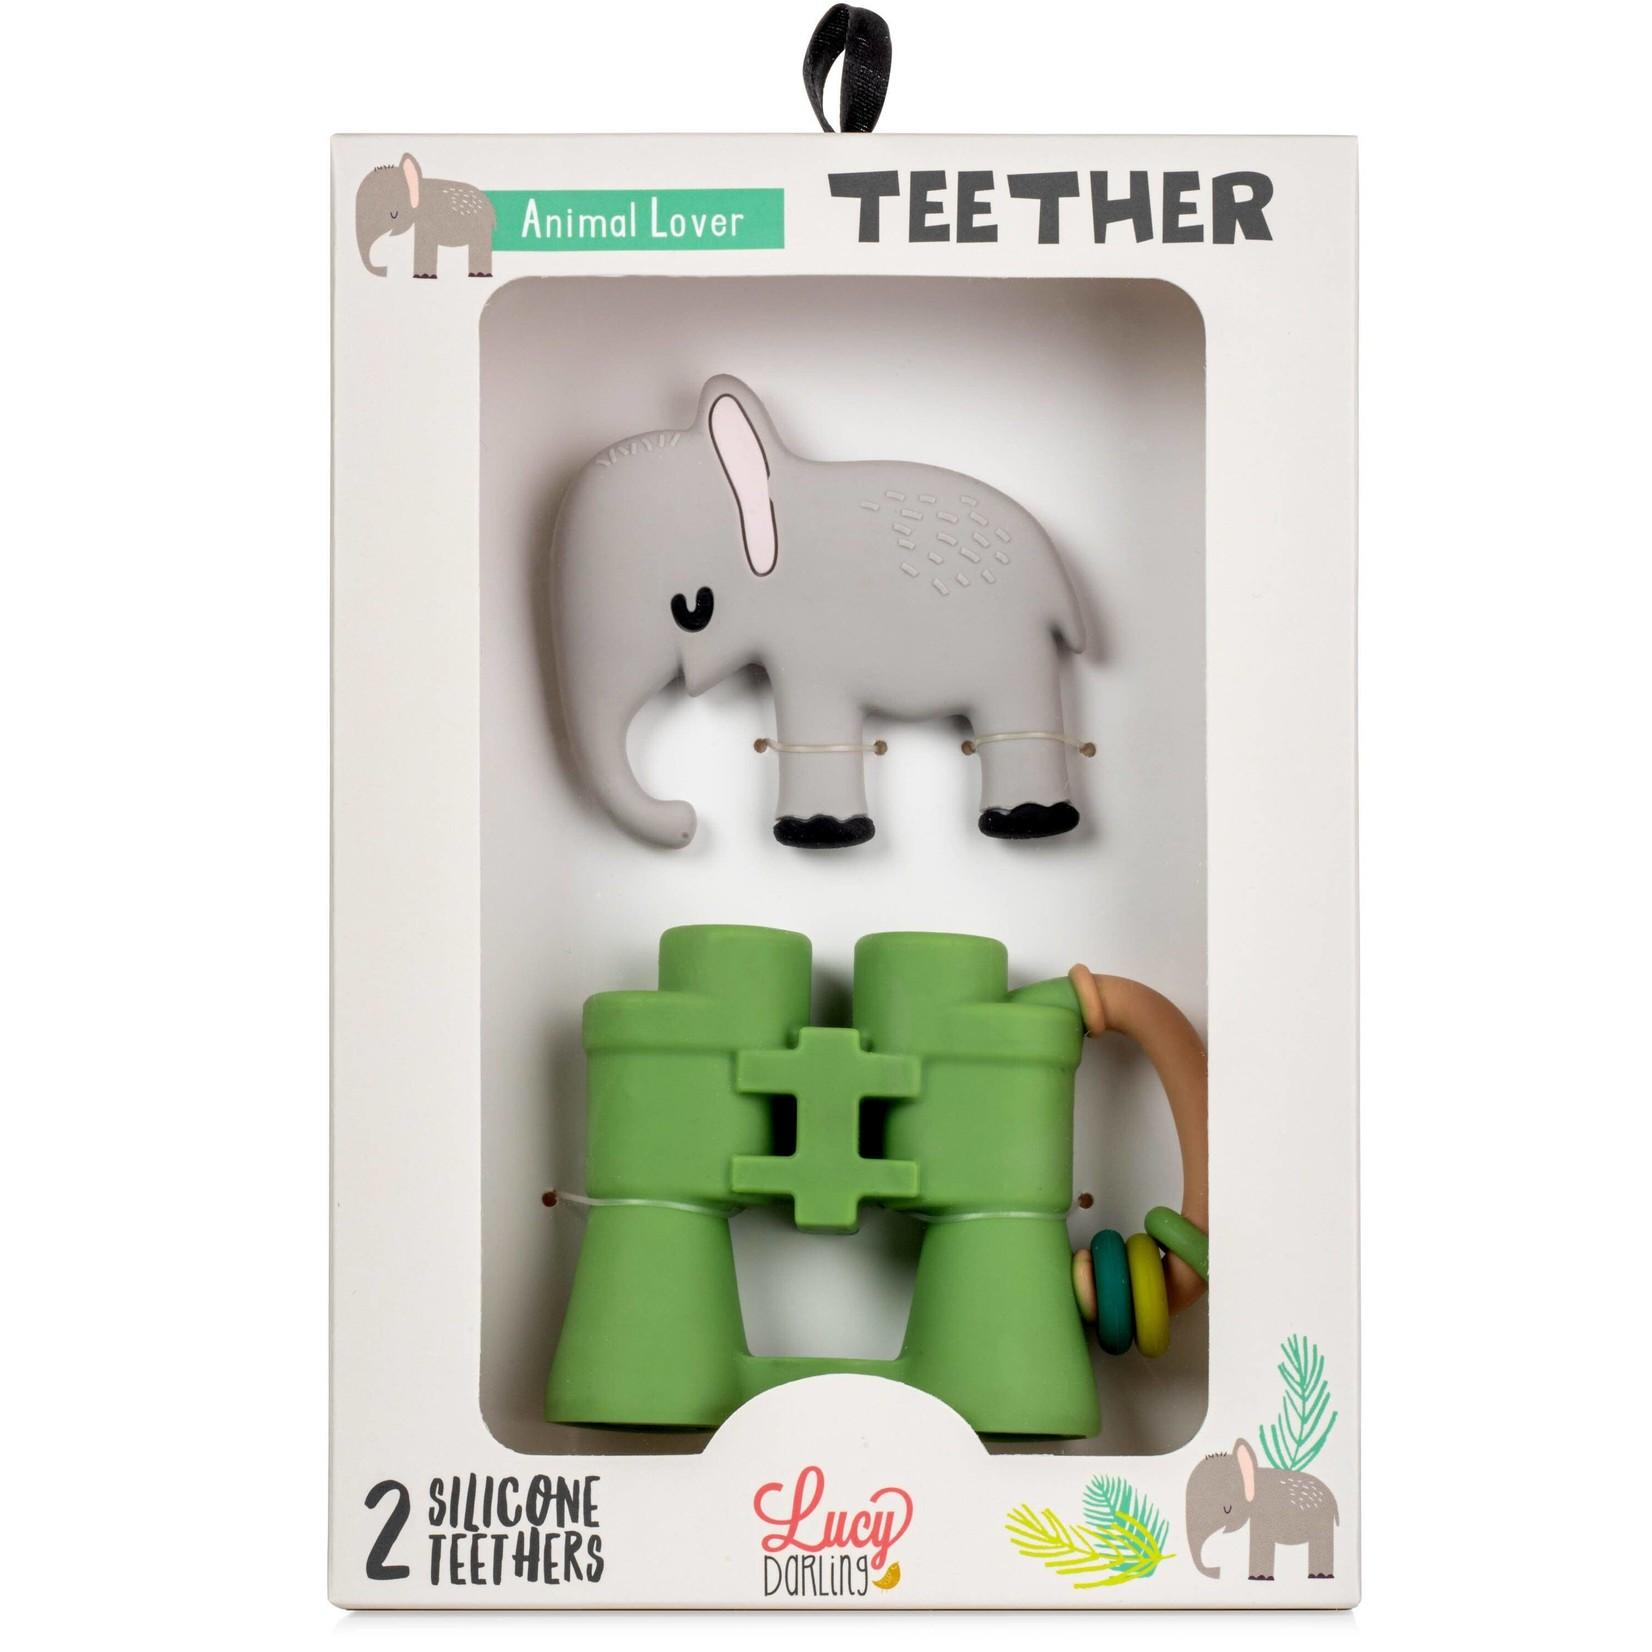 Animal Lover Teether